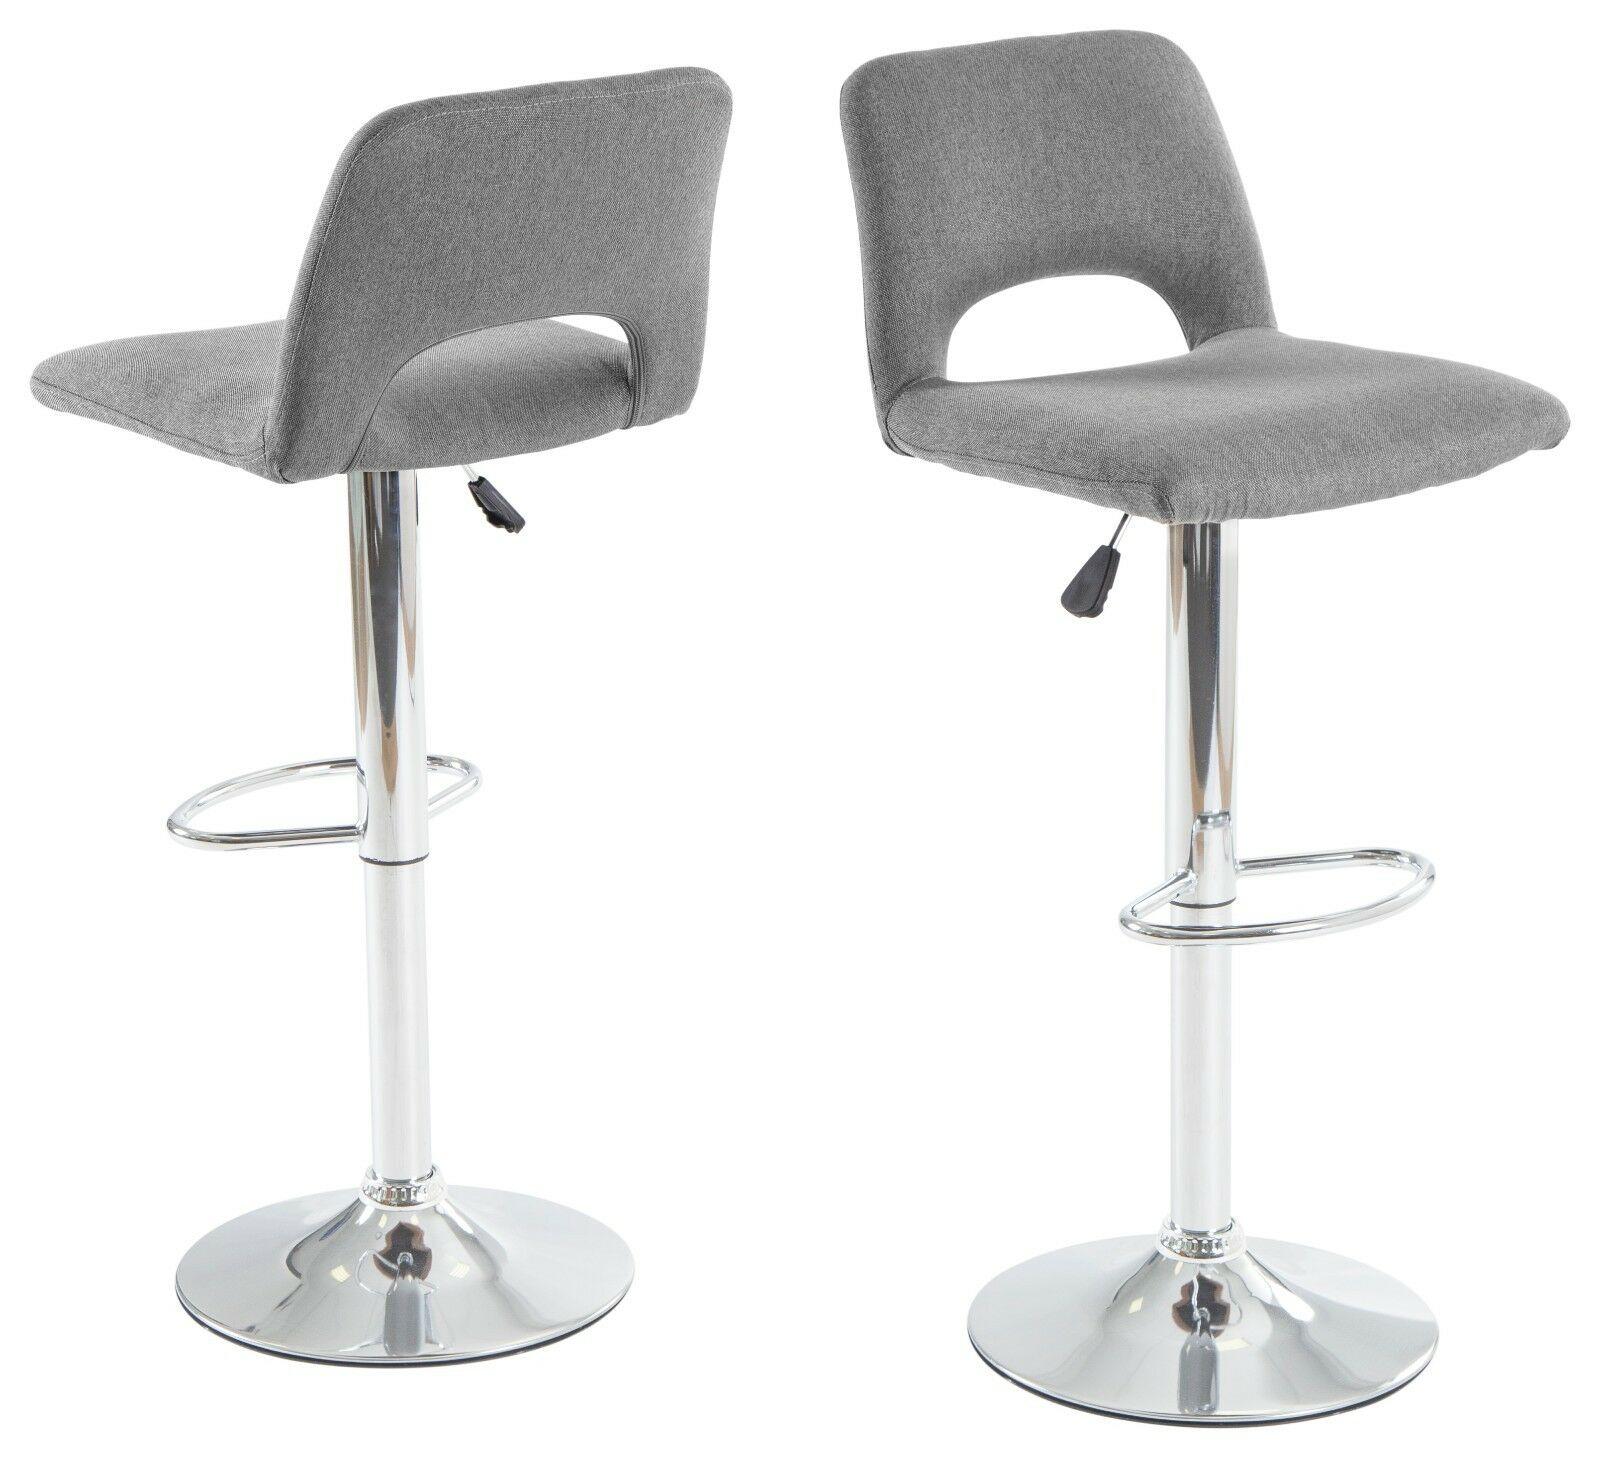 2 X Moderne Barhocker Grau Webstoff Küchenstuhl Hocker Set Design